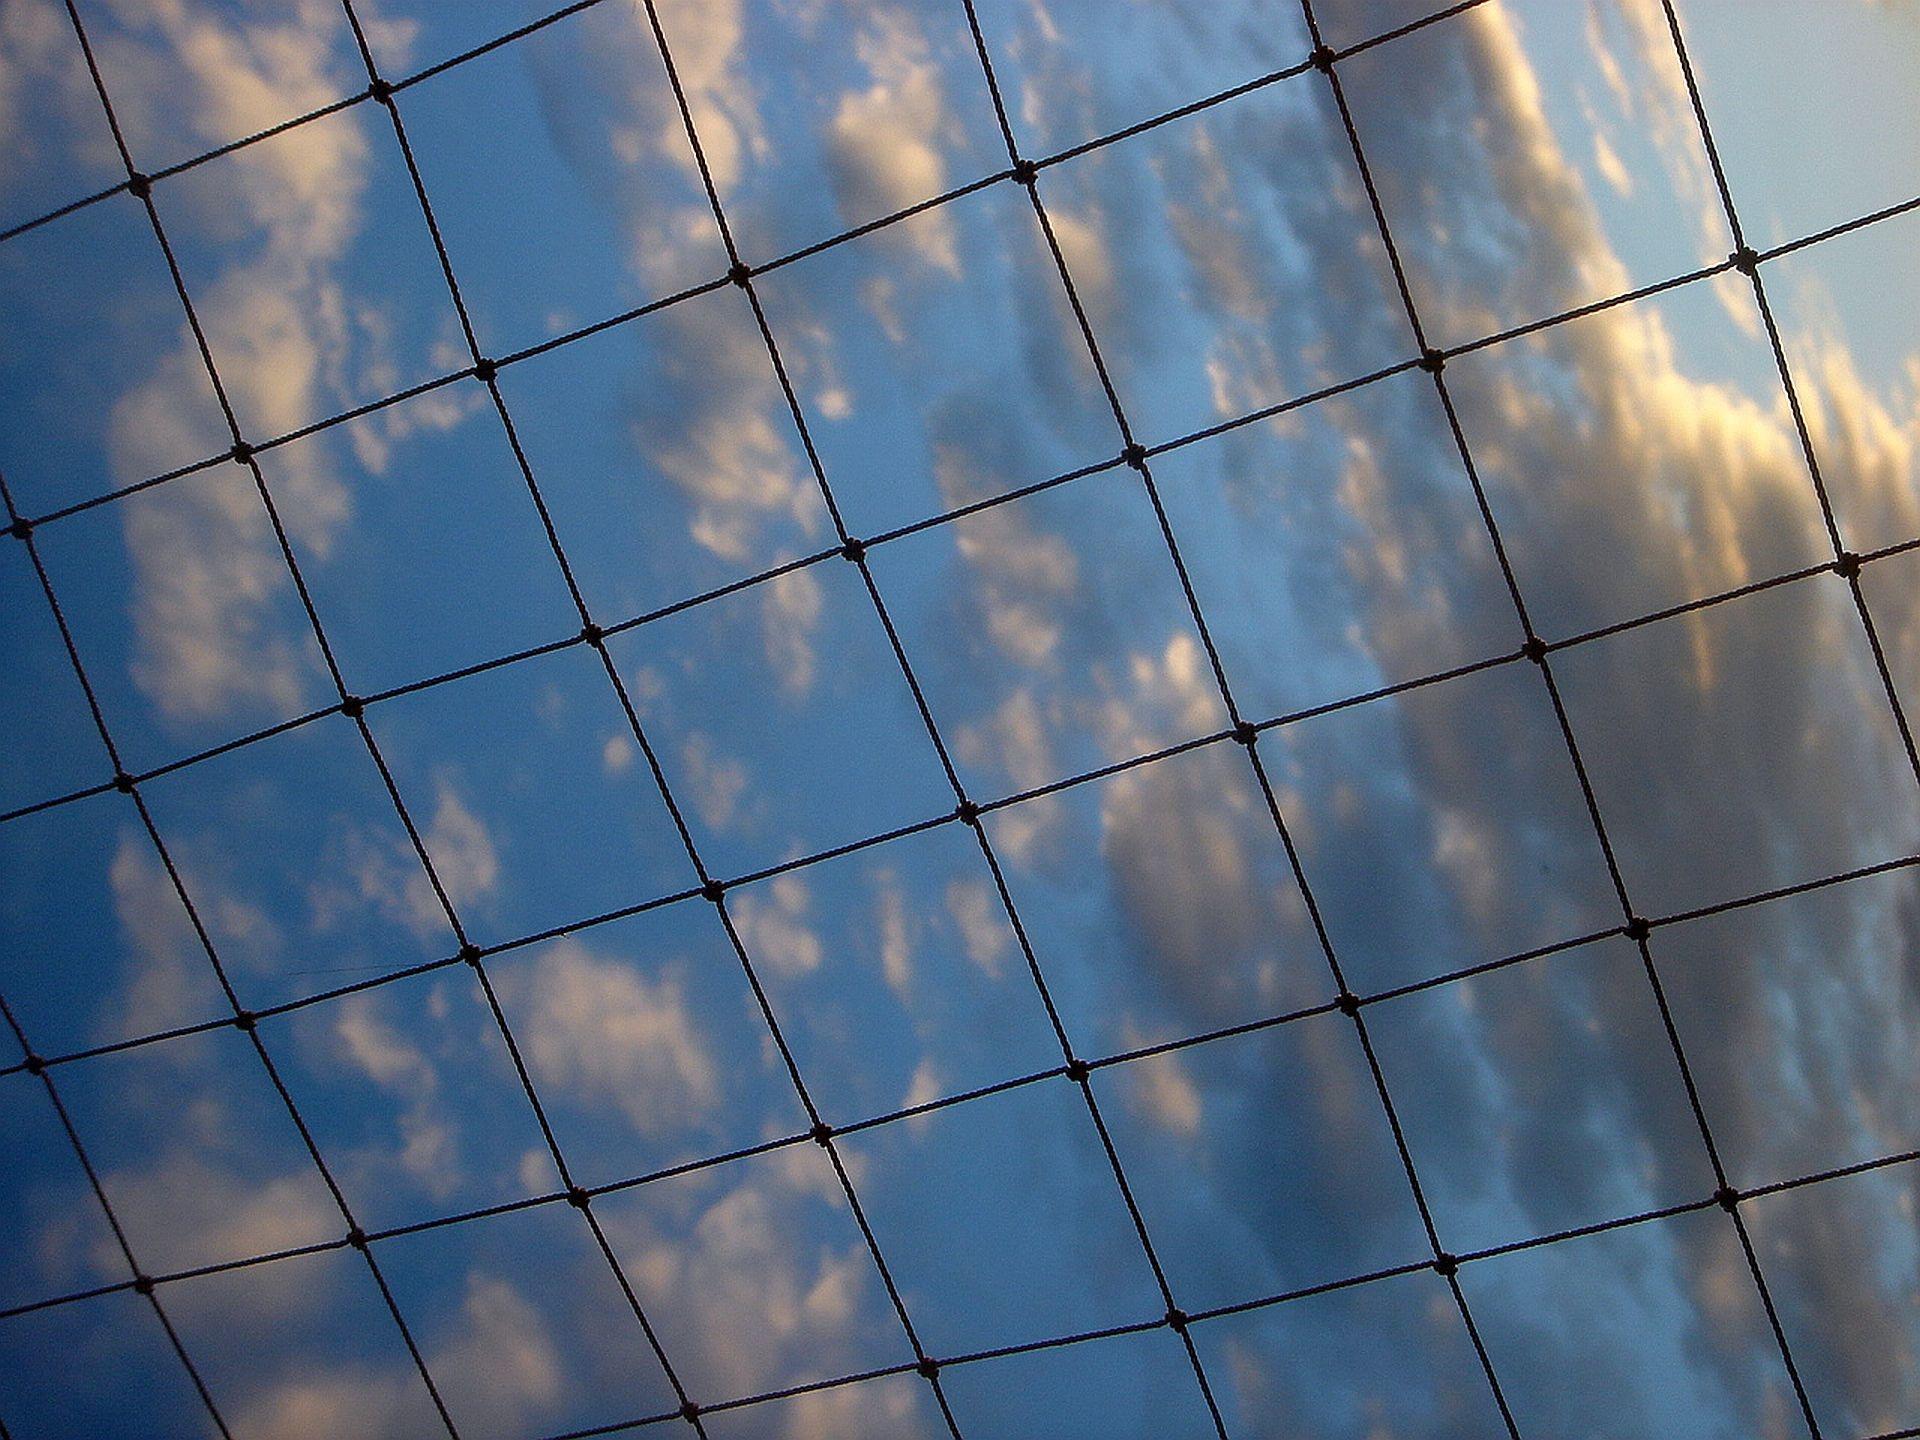 Free Images Light Sky Sunlight Texture Glass